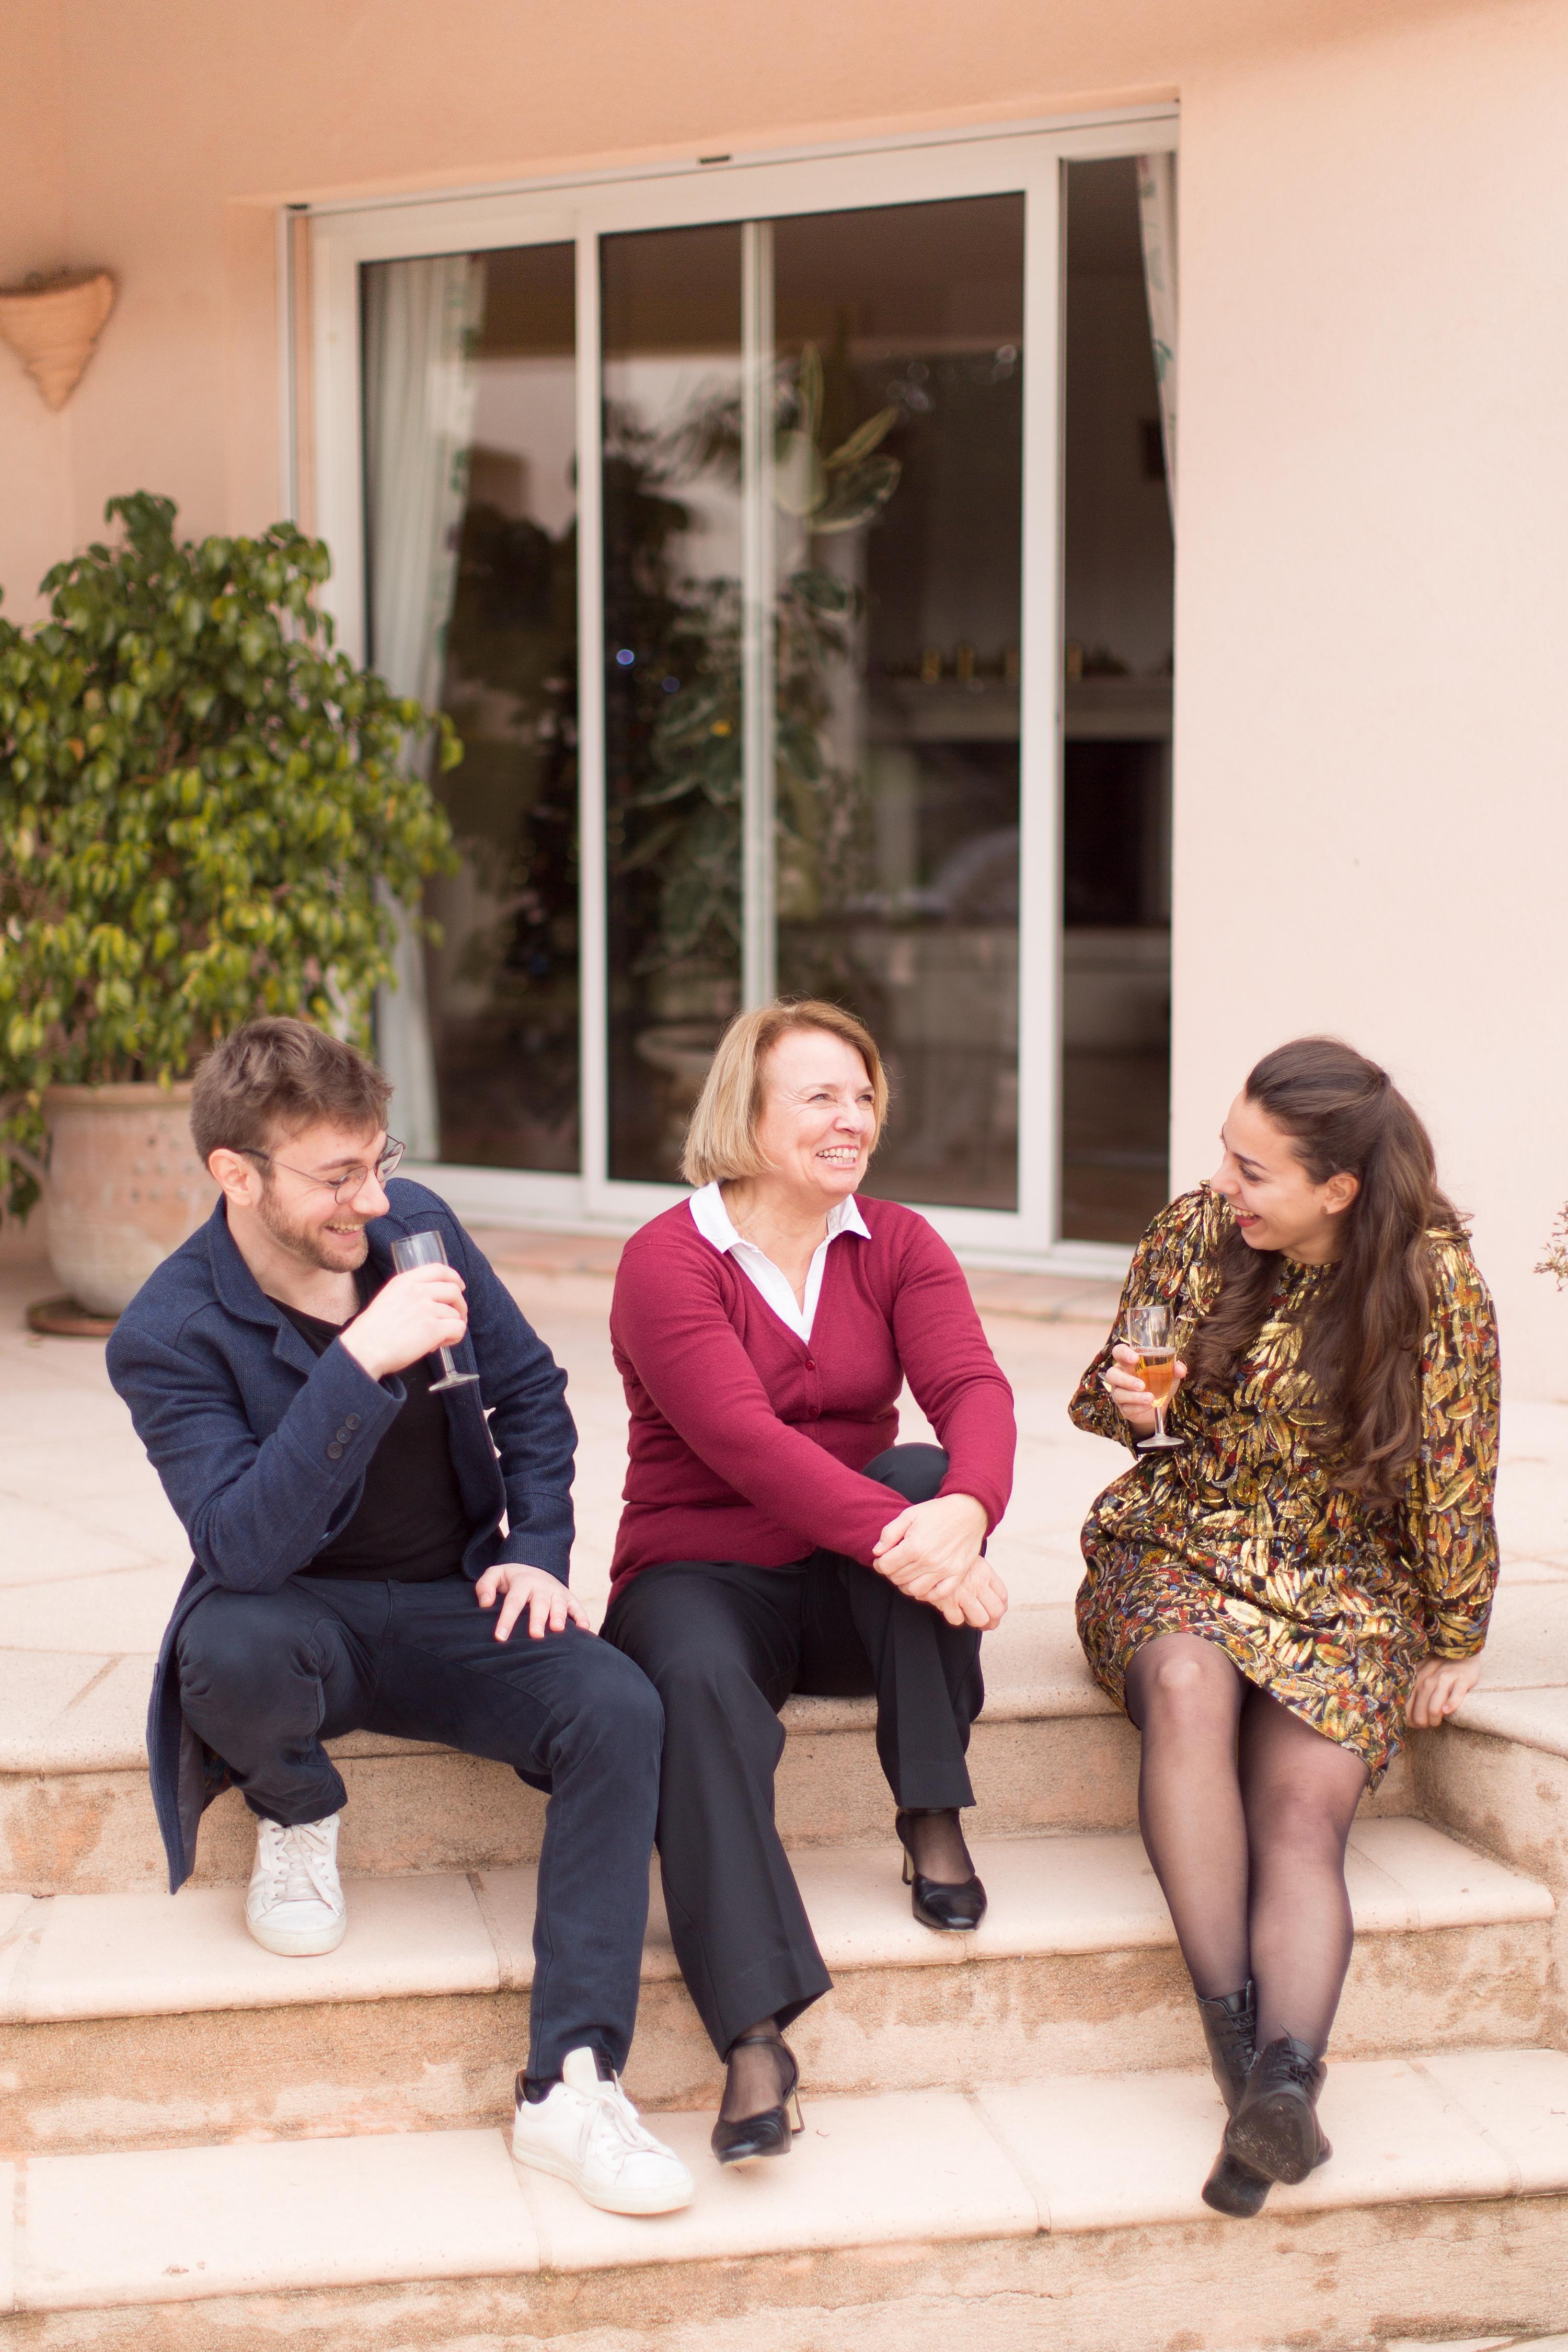 Photograhe Monaco,Photographe famille Cannes